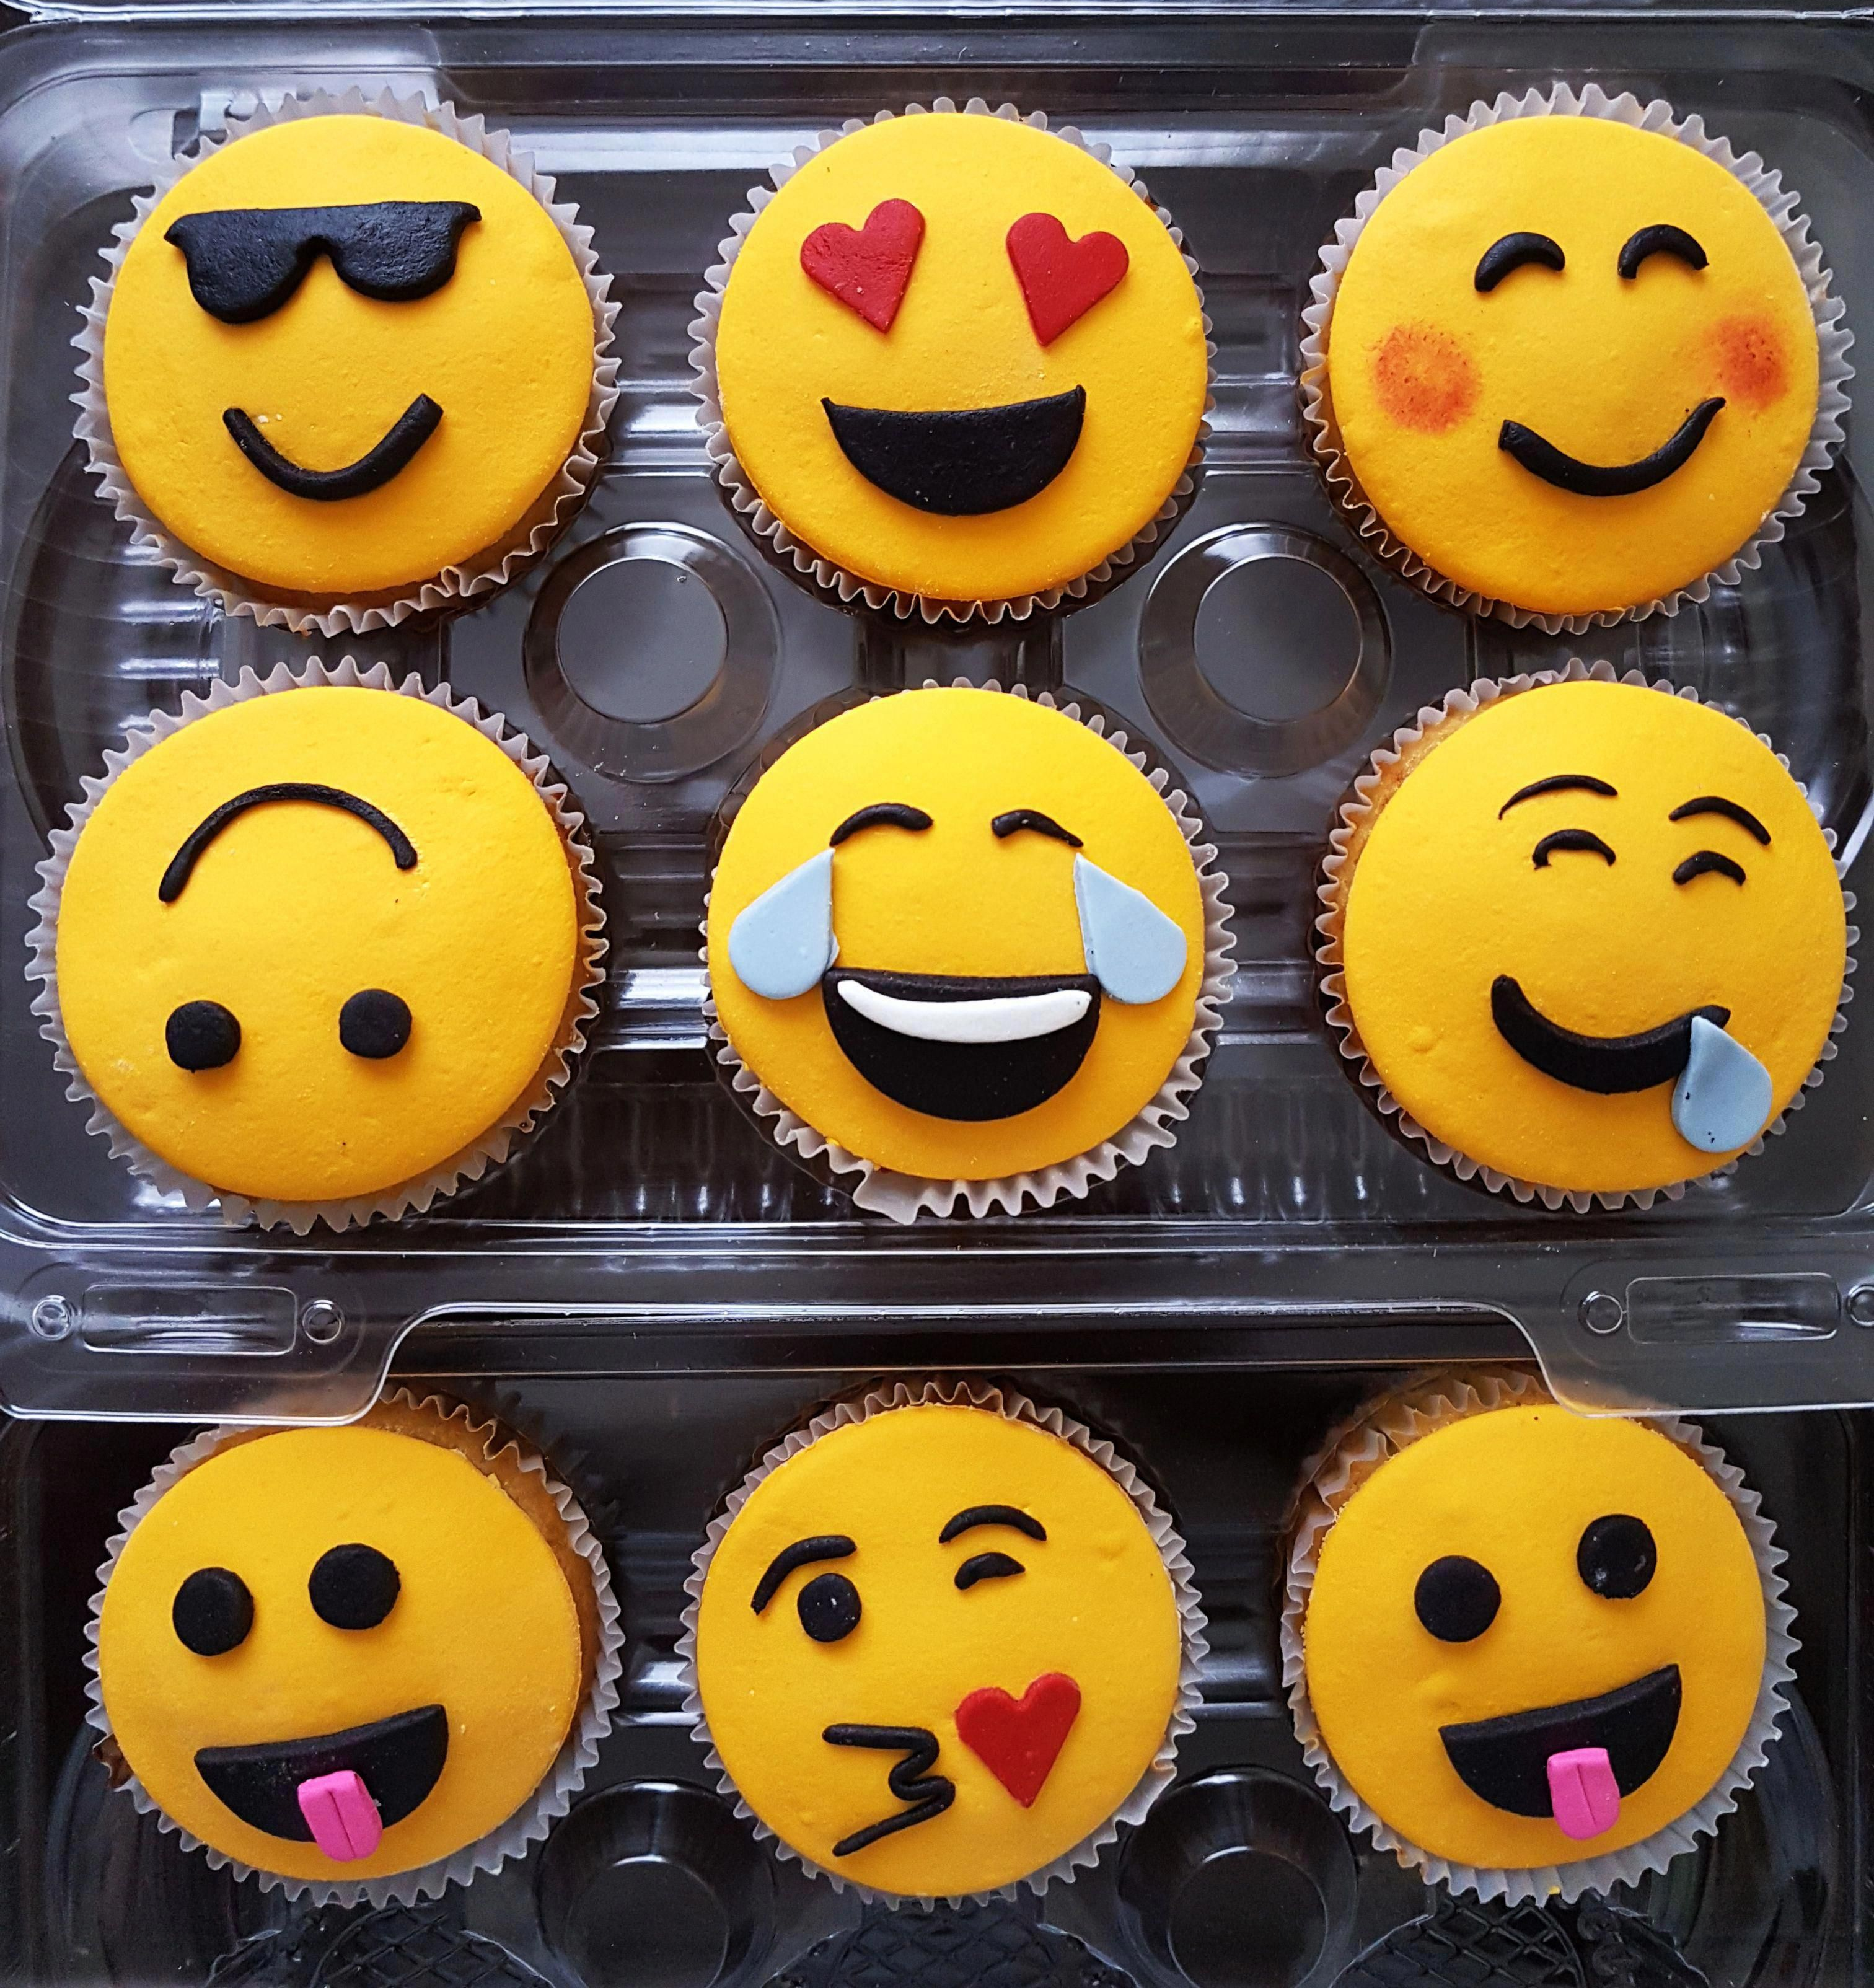 Raspberry Apple Smoothie Clean Eating Snacks Recipe In 2020 Emoji Cupcakes Emoji Cake Savoury Cake